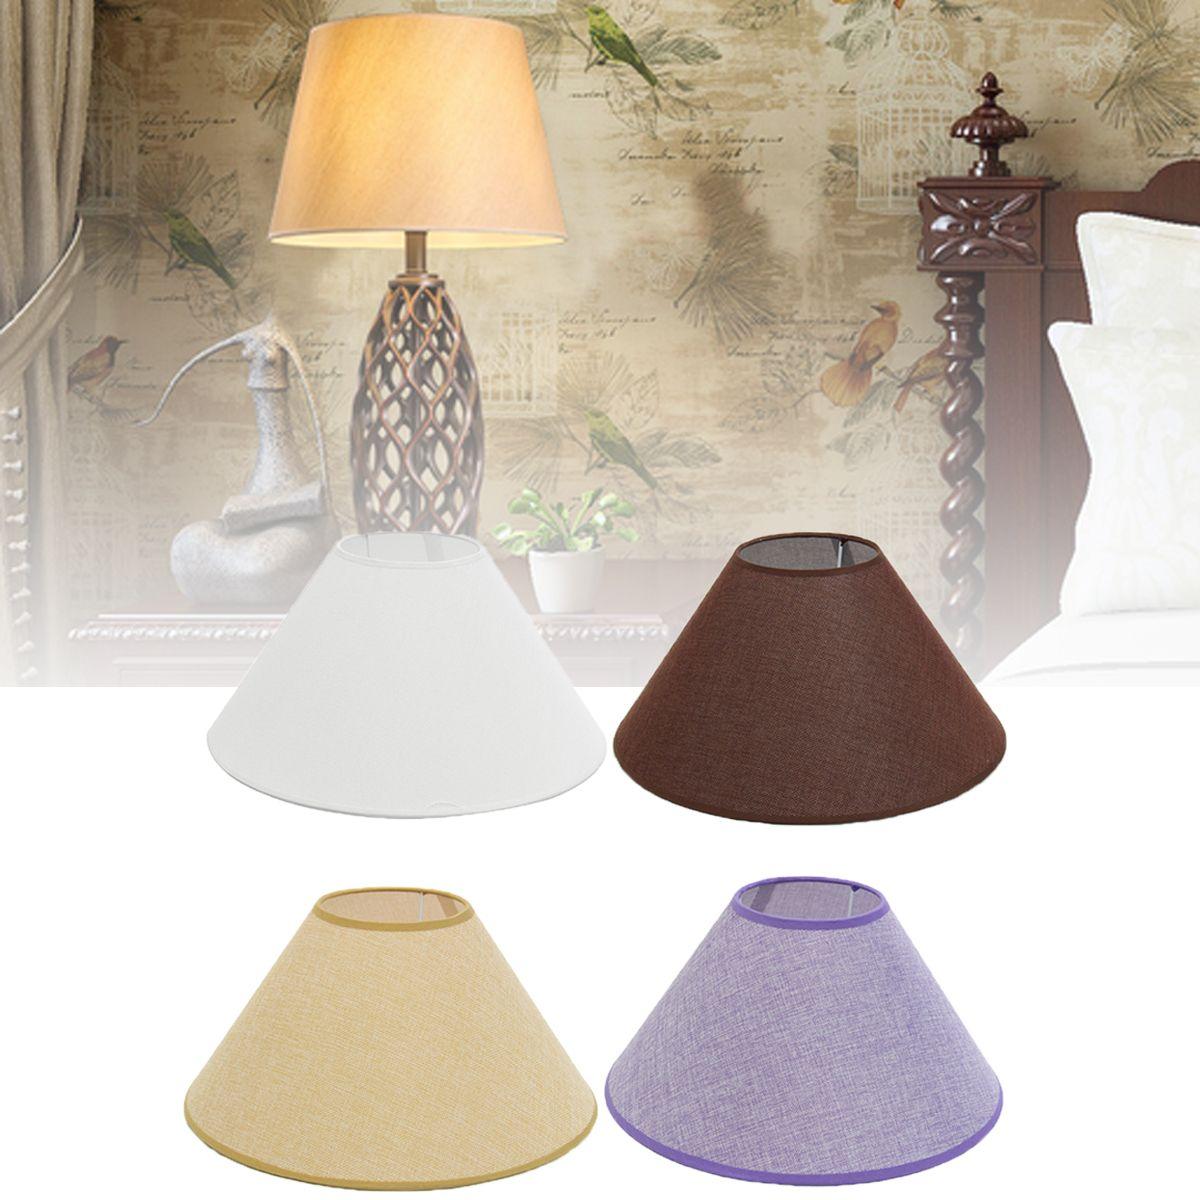 Us 11 09 13 36 18cm Ceiling Lamp Shade Cotton Textured Fabric Pvc Linen Room Table Lampshape Cm Ceilin Ceiling Lamp Shades Ceiling Lamp Light Accessories